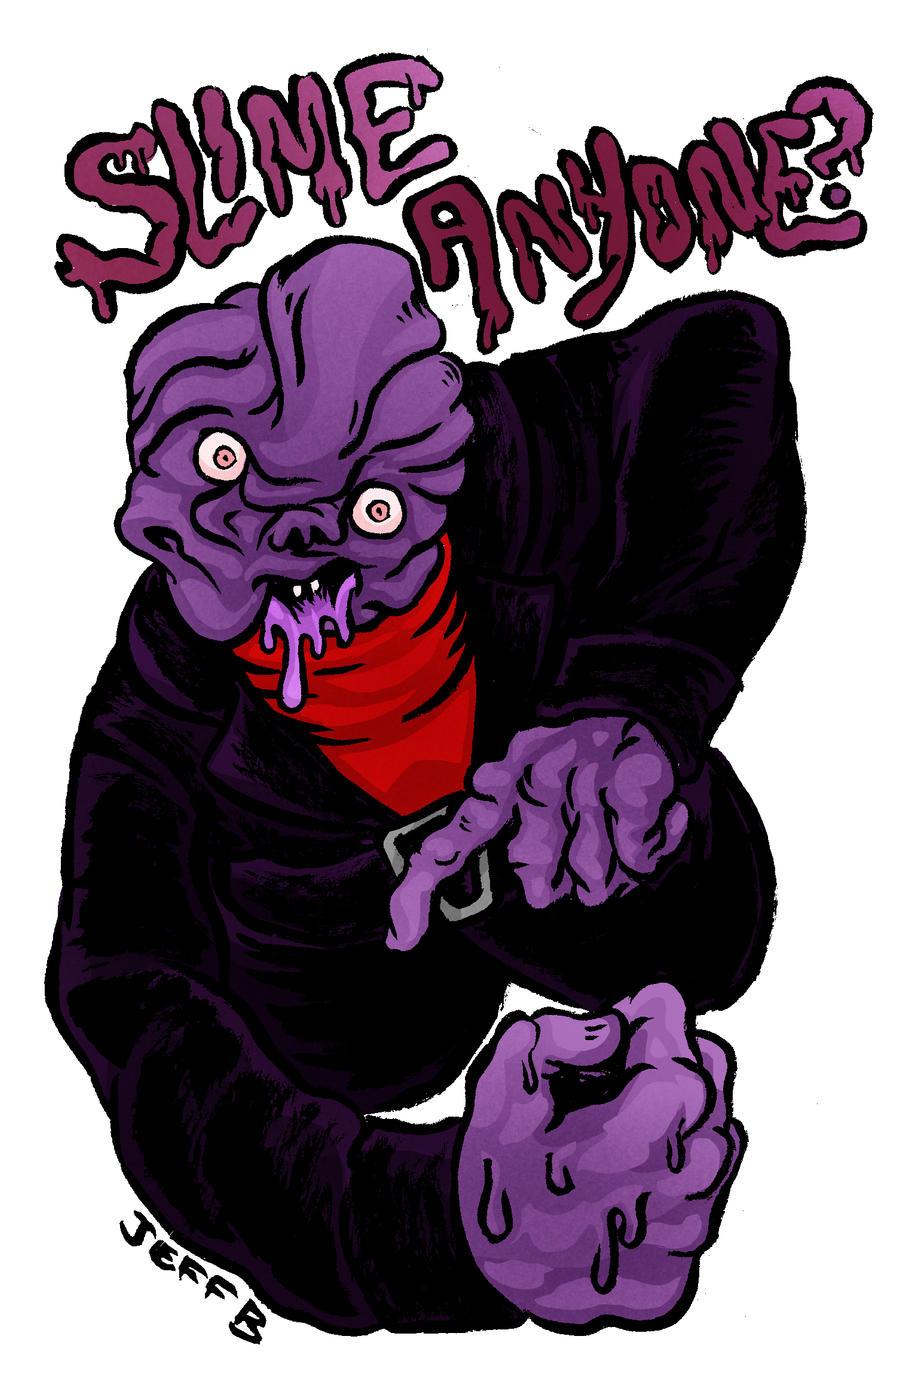 ghostwriter slime monster